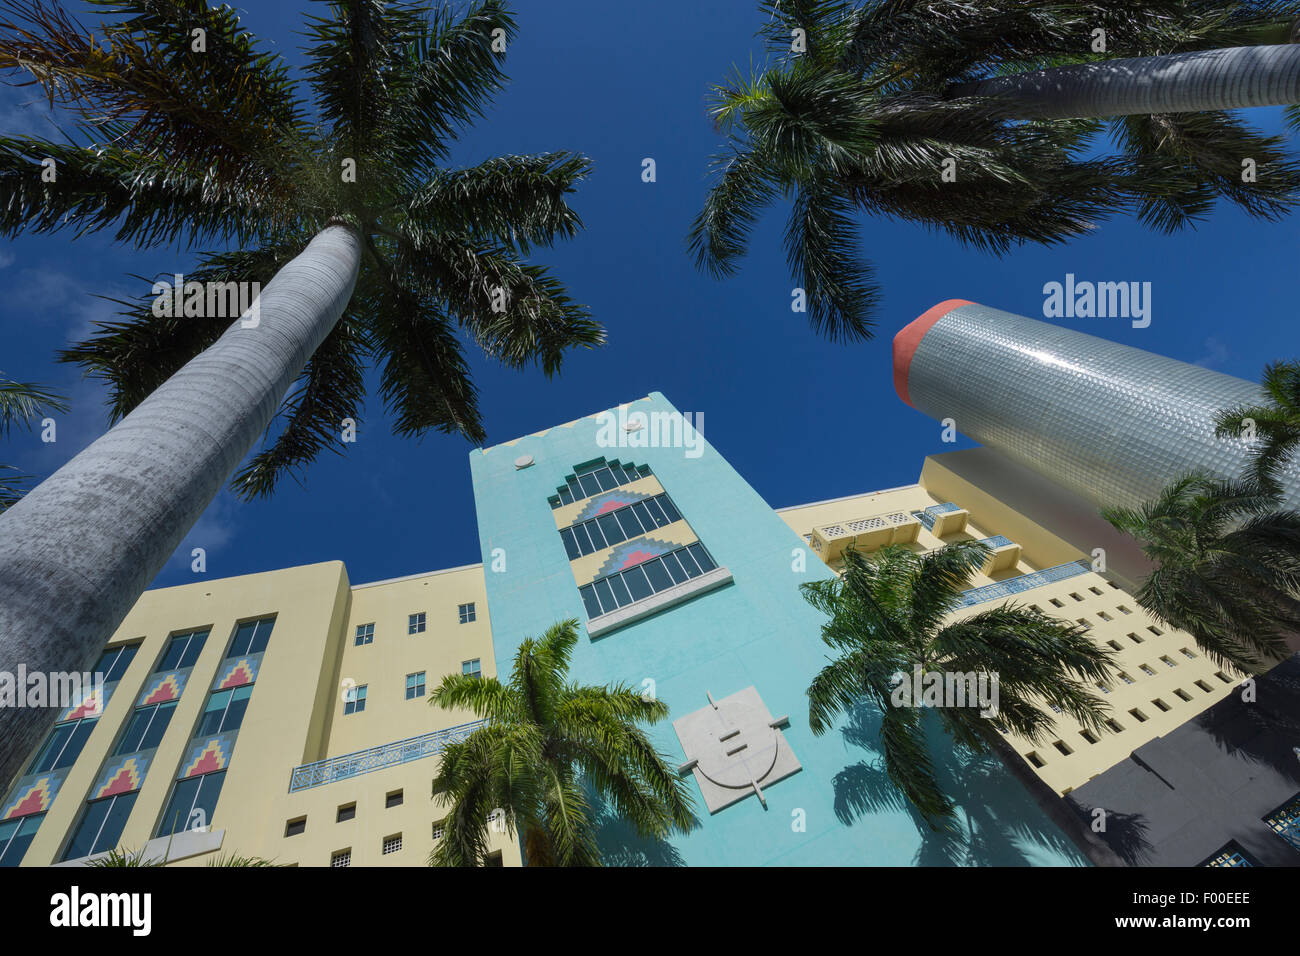 ART DECO STYLE BUILDING WASHINGTON AVENUE SOUTH BEACH MIAMI BEACH FLORIDA USA - Stock Image